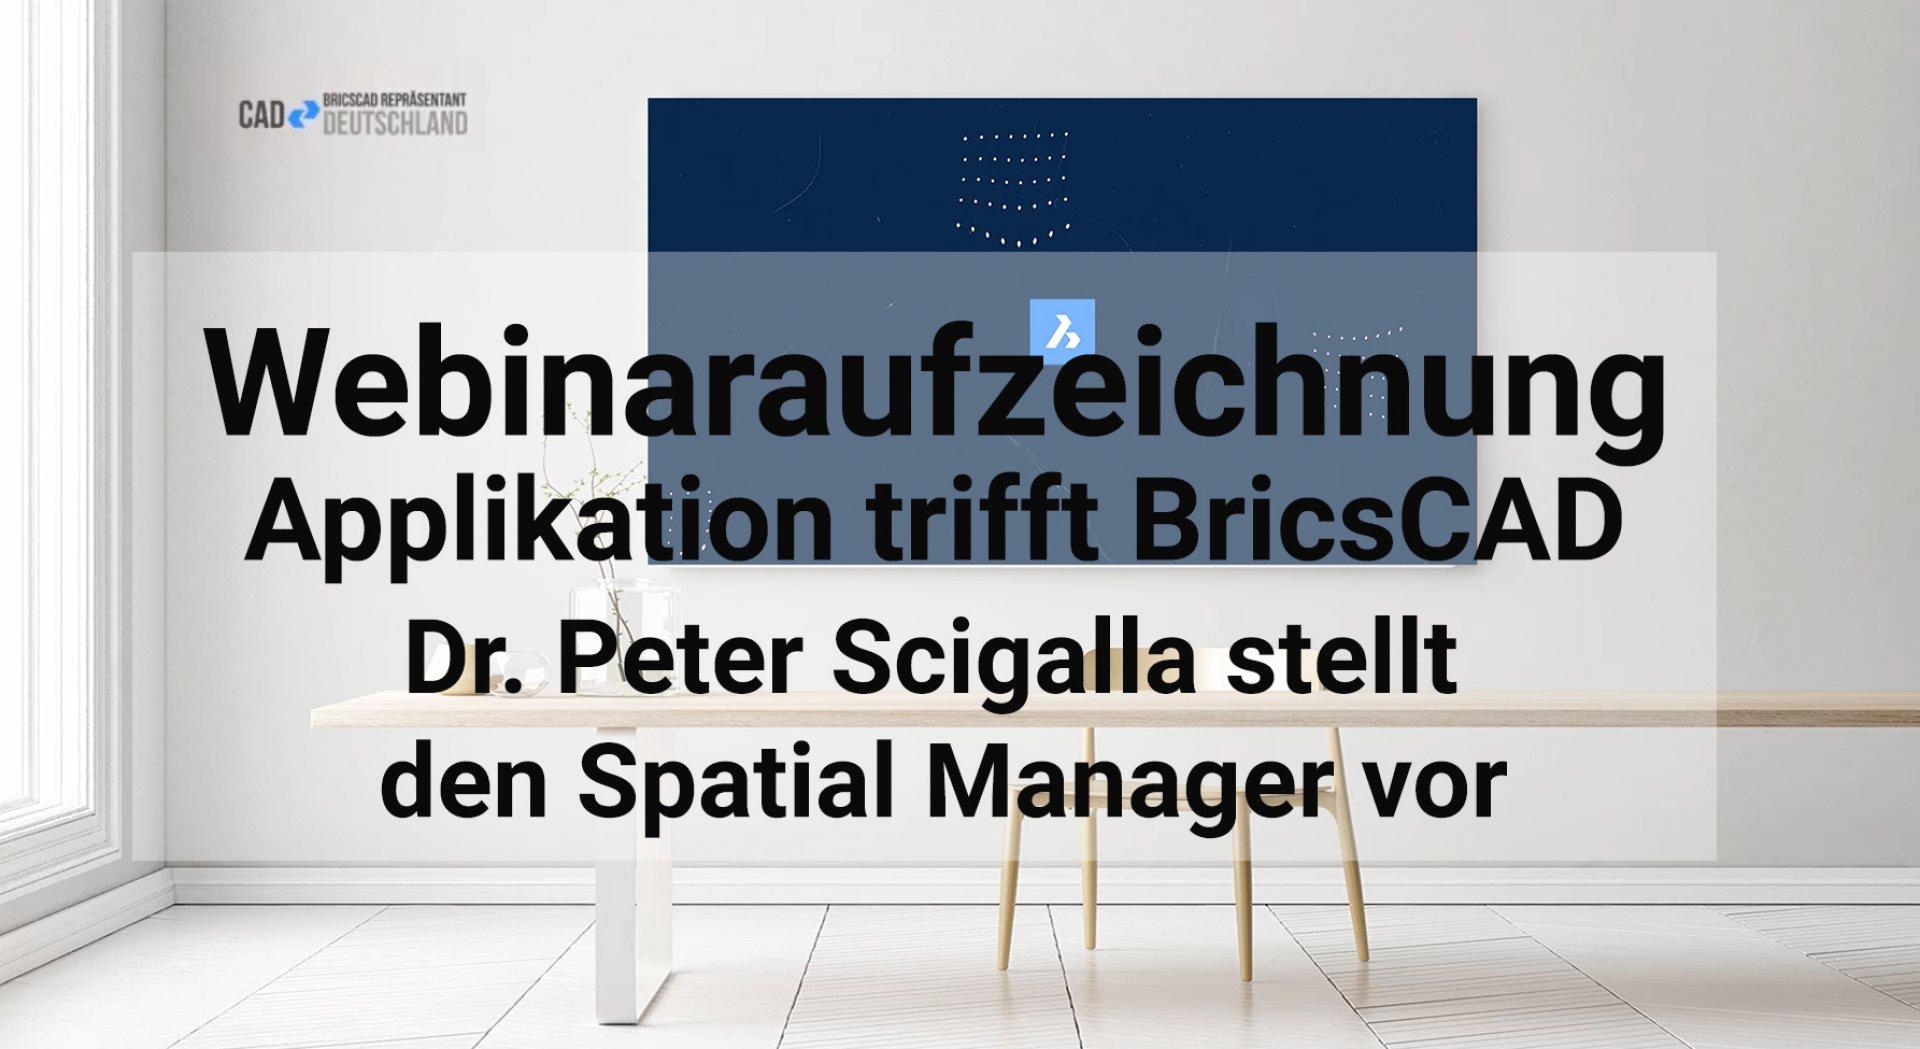 Applikation trifft BricsCAD - Spatial Manager vorgestellt